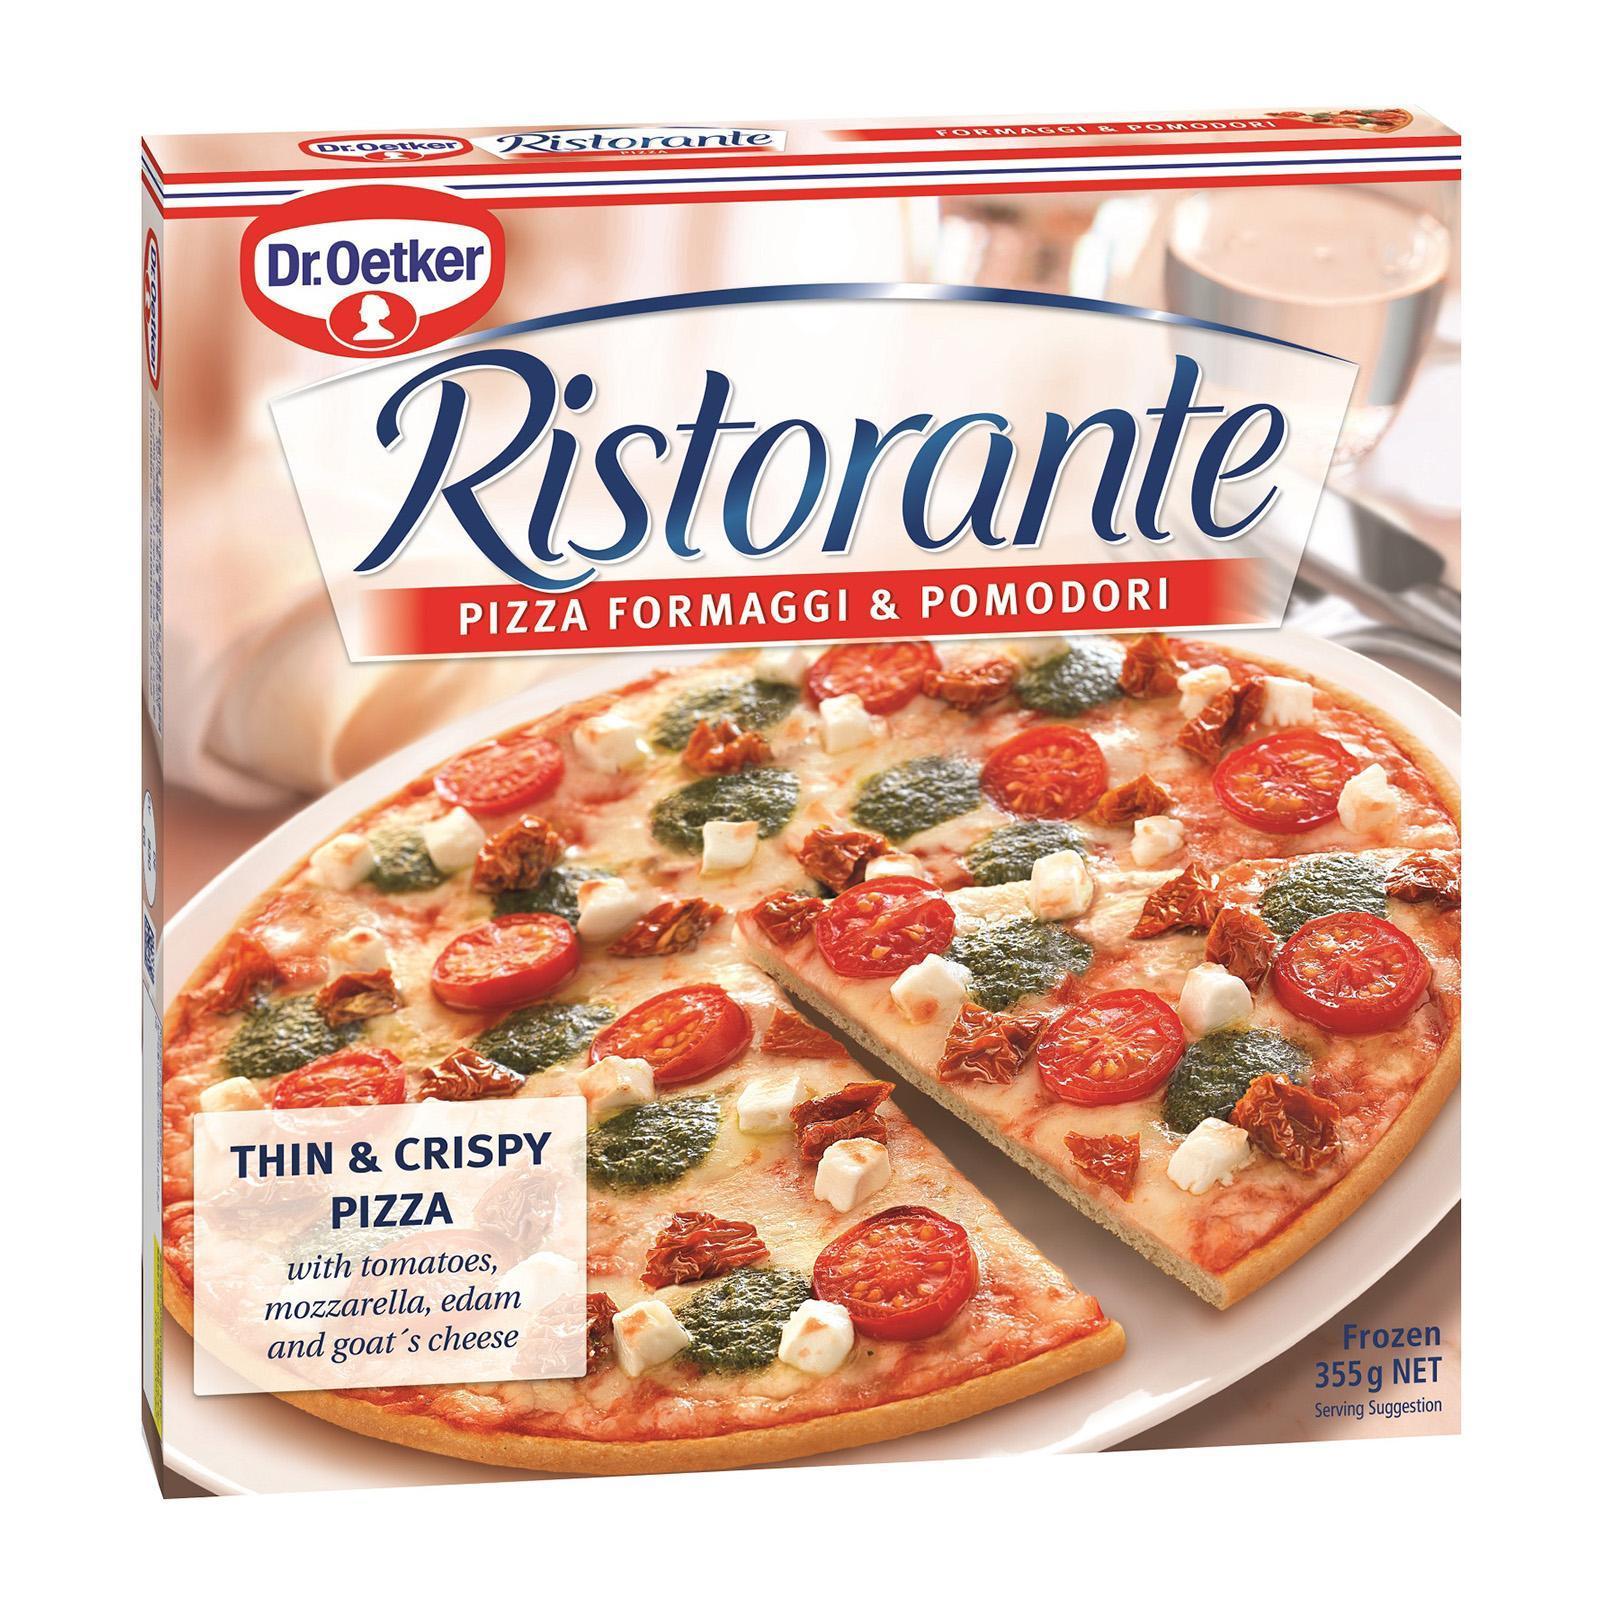 Dr Oetker Ristorante - Formaggi And Pomodori - Frozen By Redmart.